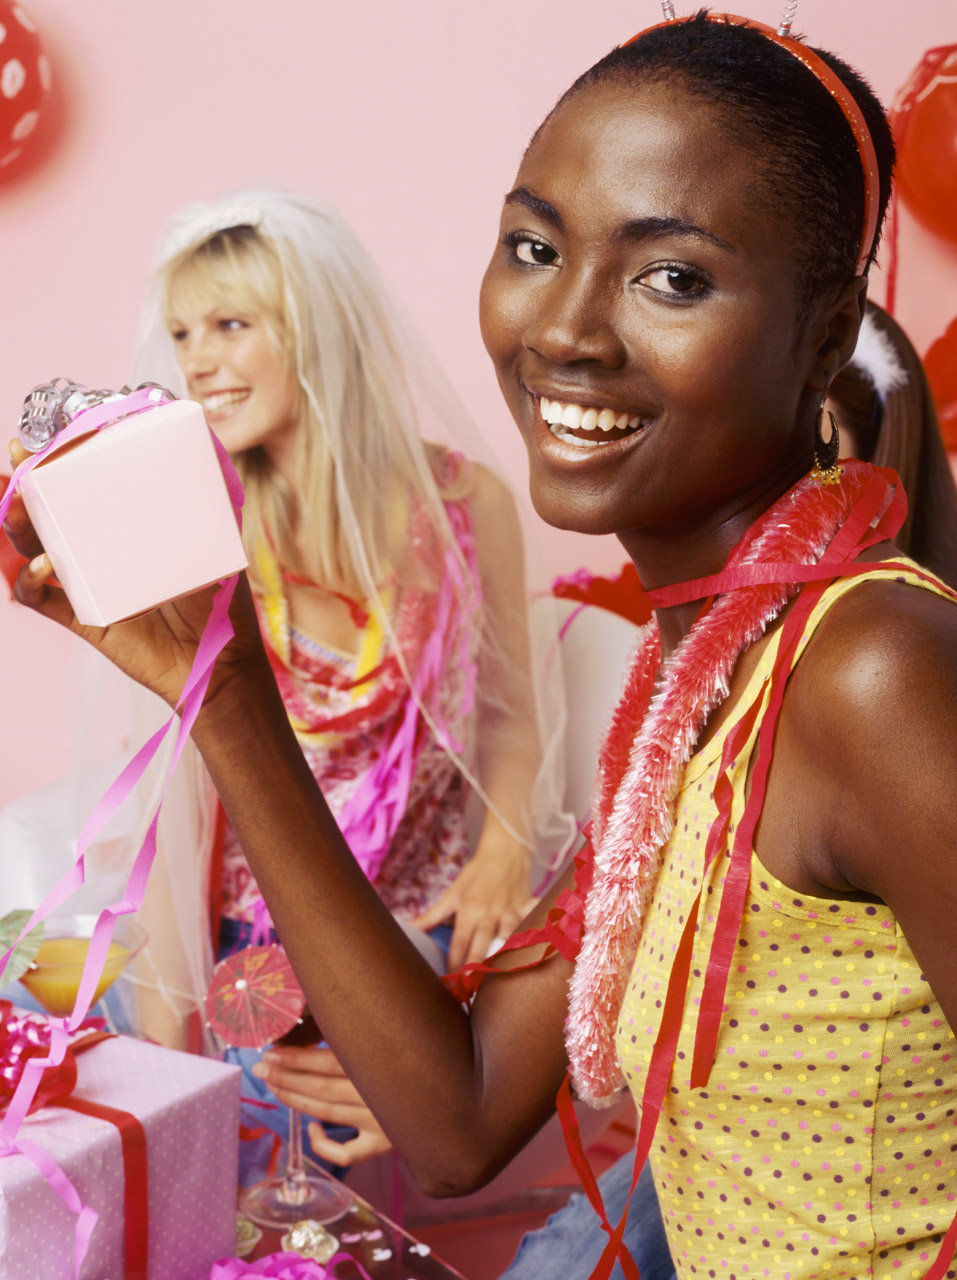 DIY Girls' Night/Bachelorette Party